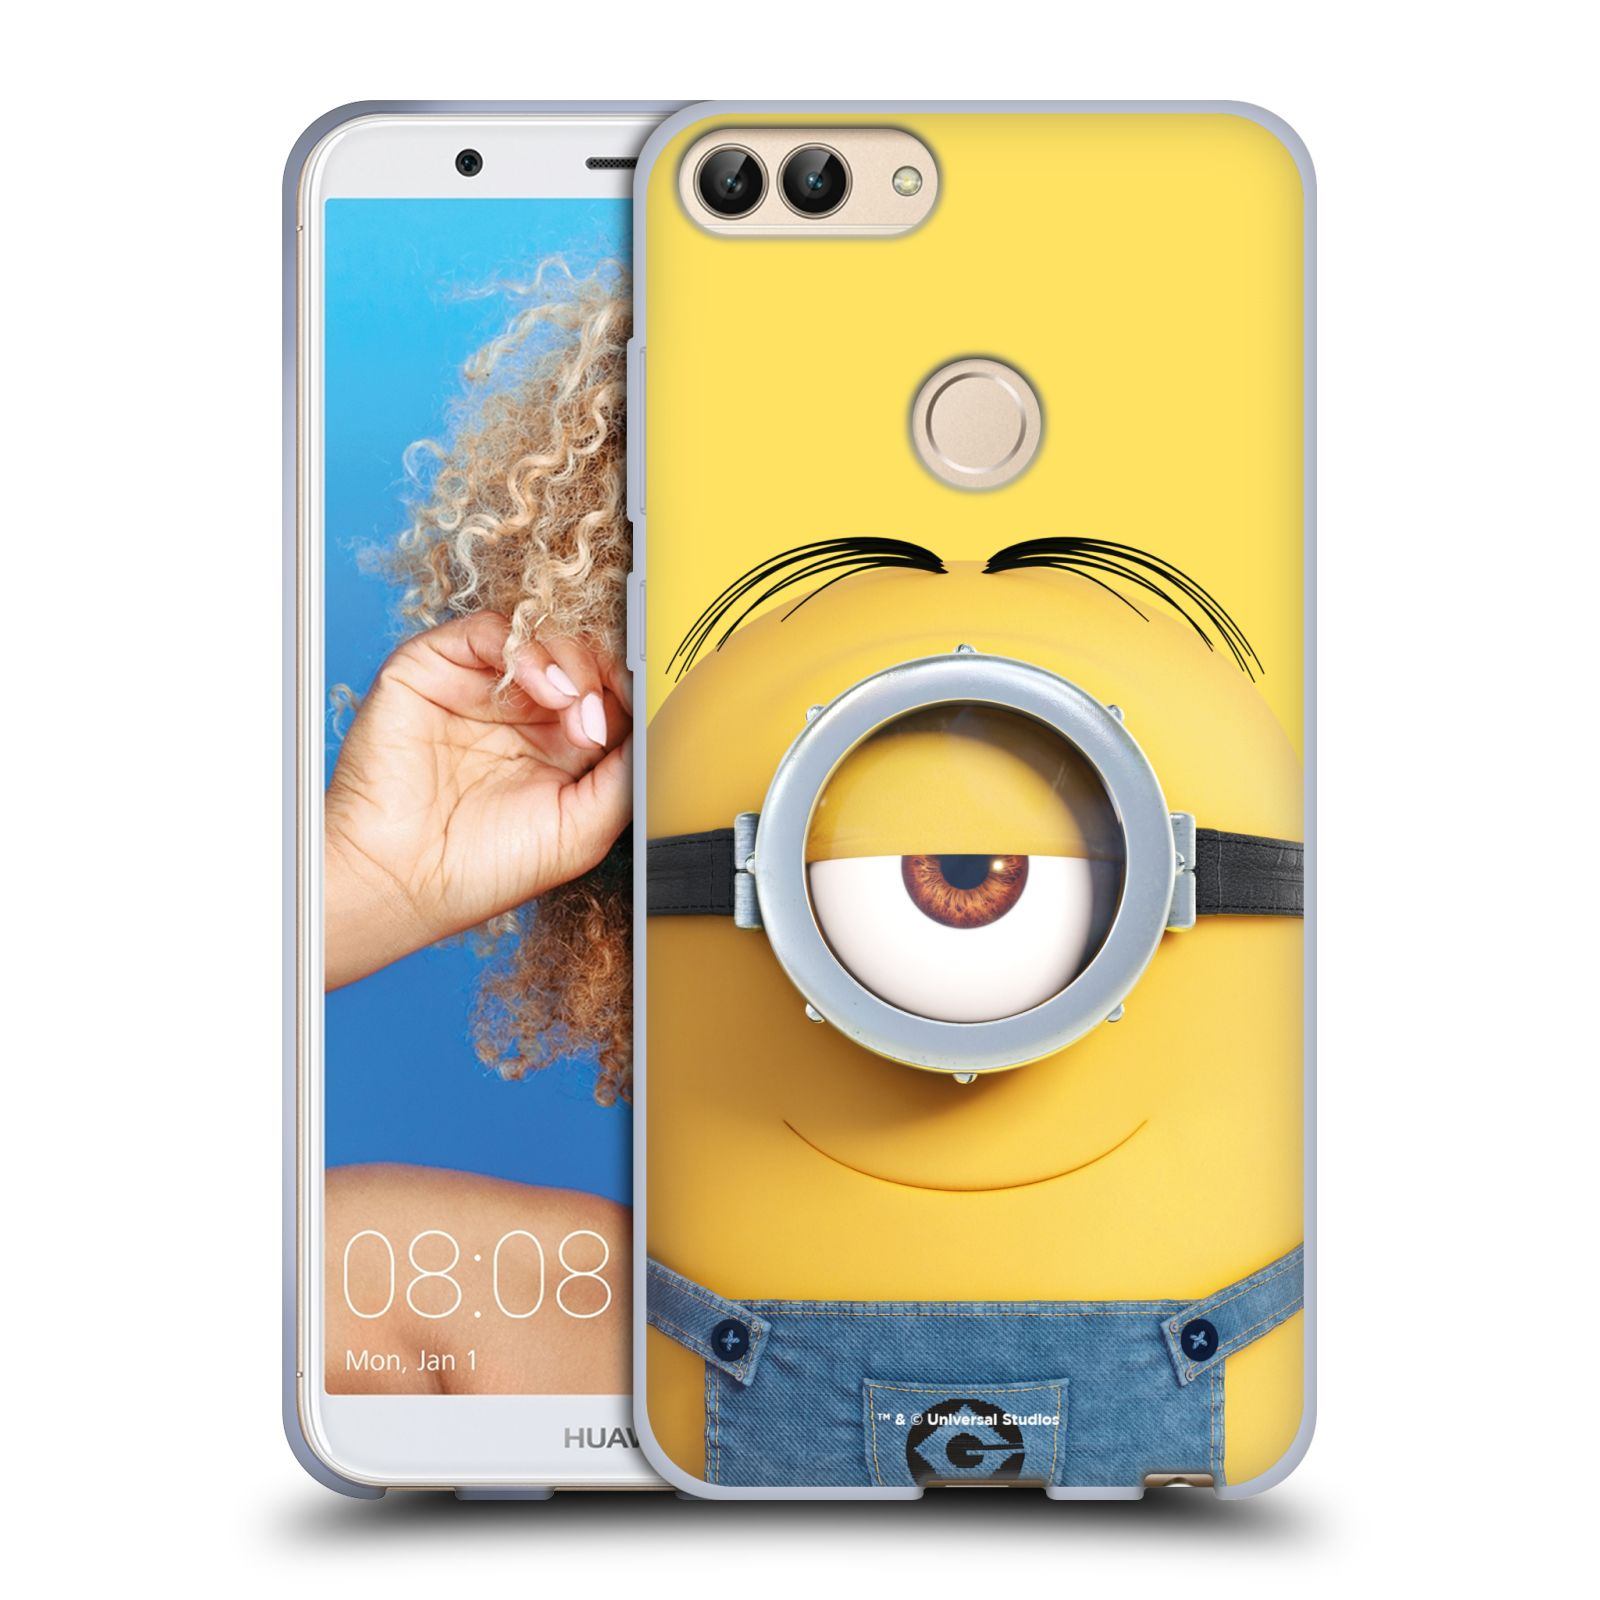 Silikonové pouzdro na mobil Huawei P Smart - Head Case - Mimoň Stuart z filmu Já, padouch - Despicable Me